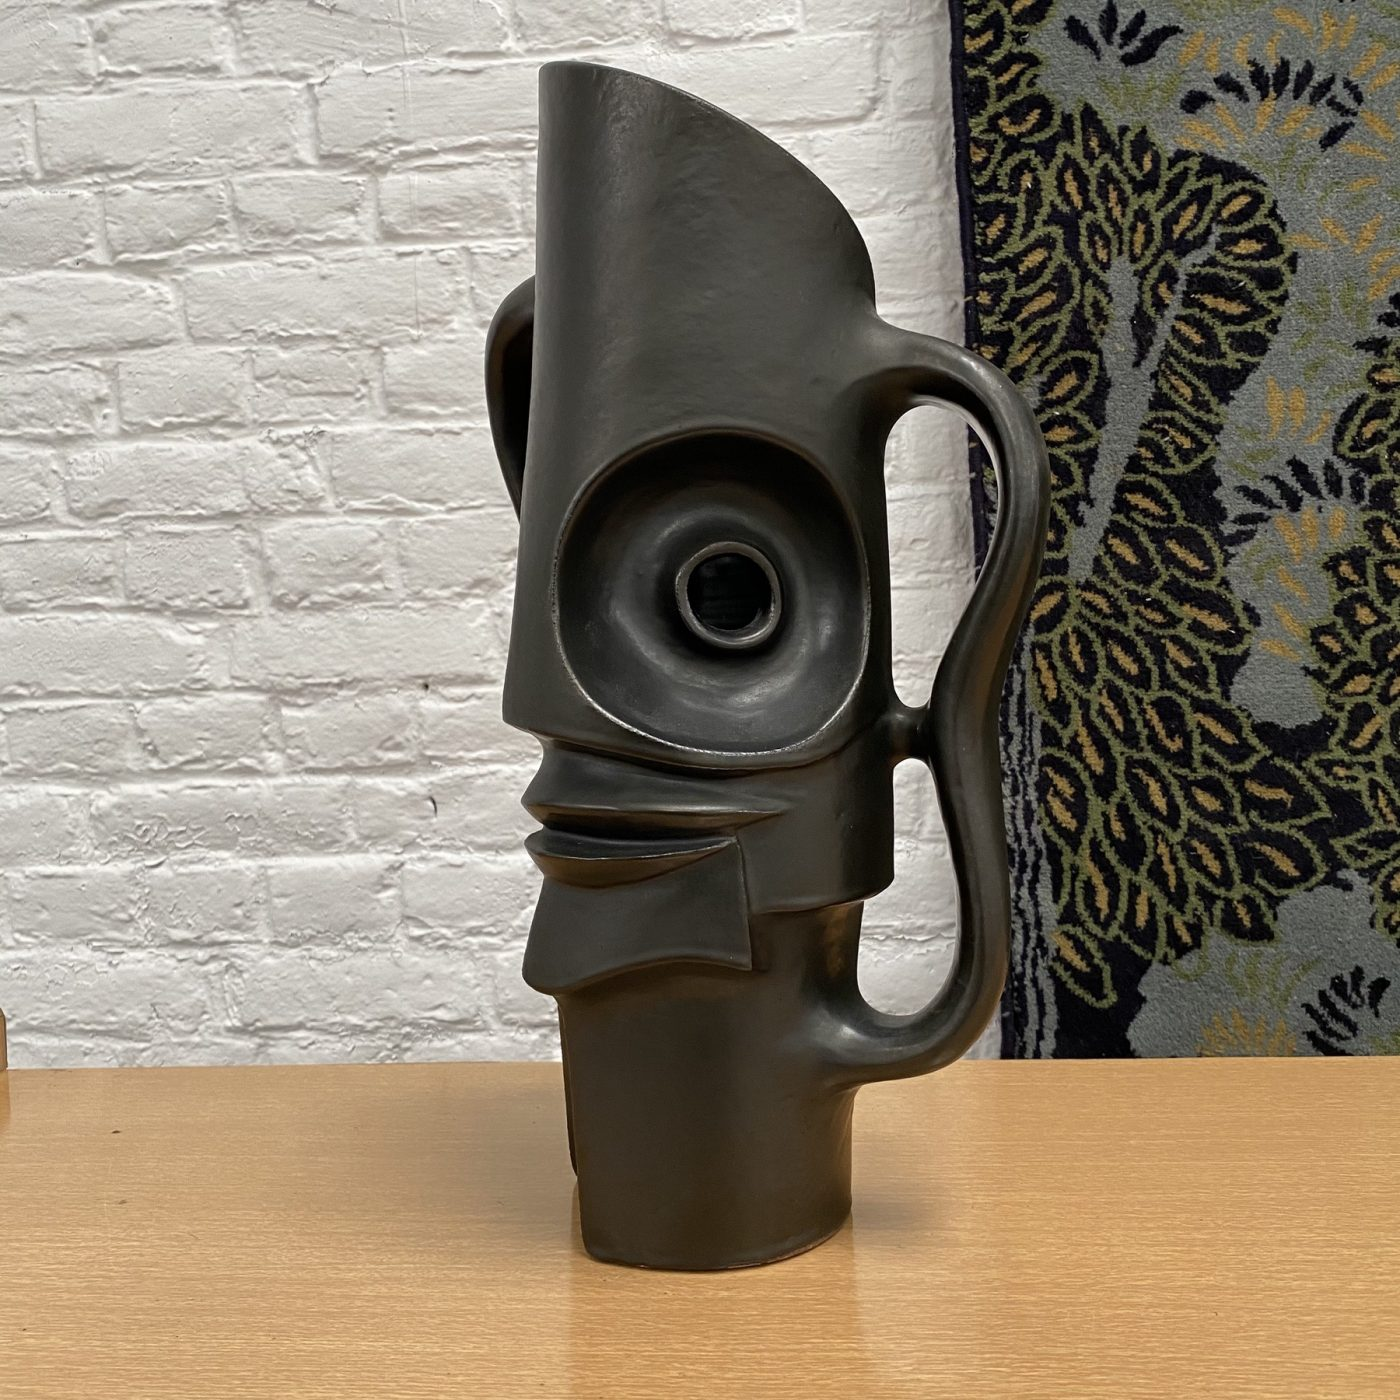 objet-vagabond-ceramic-sculpture0004